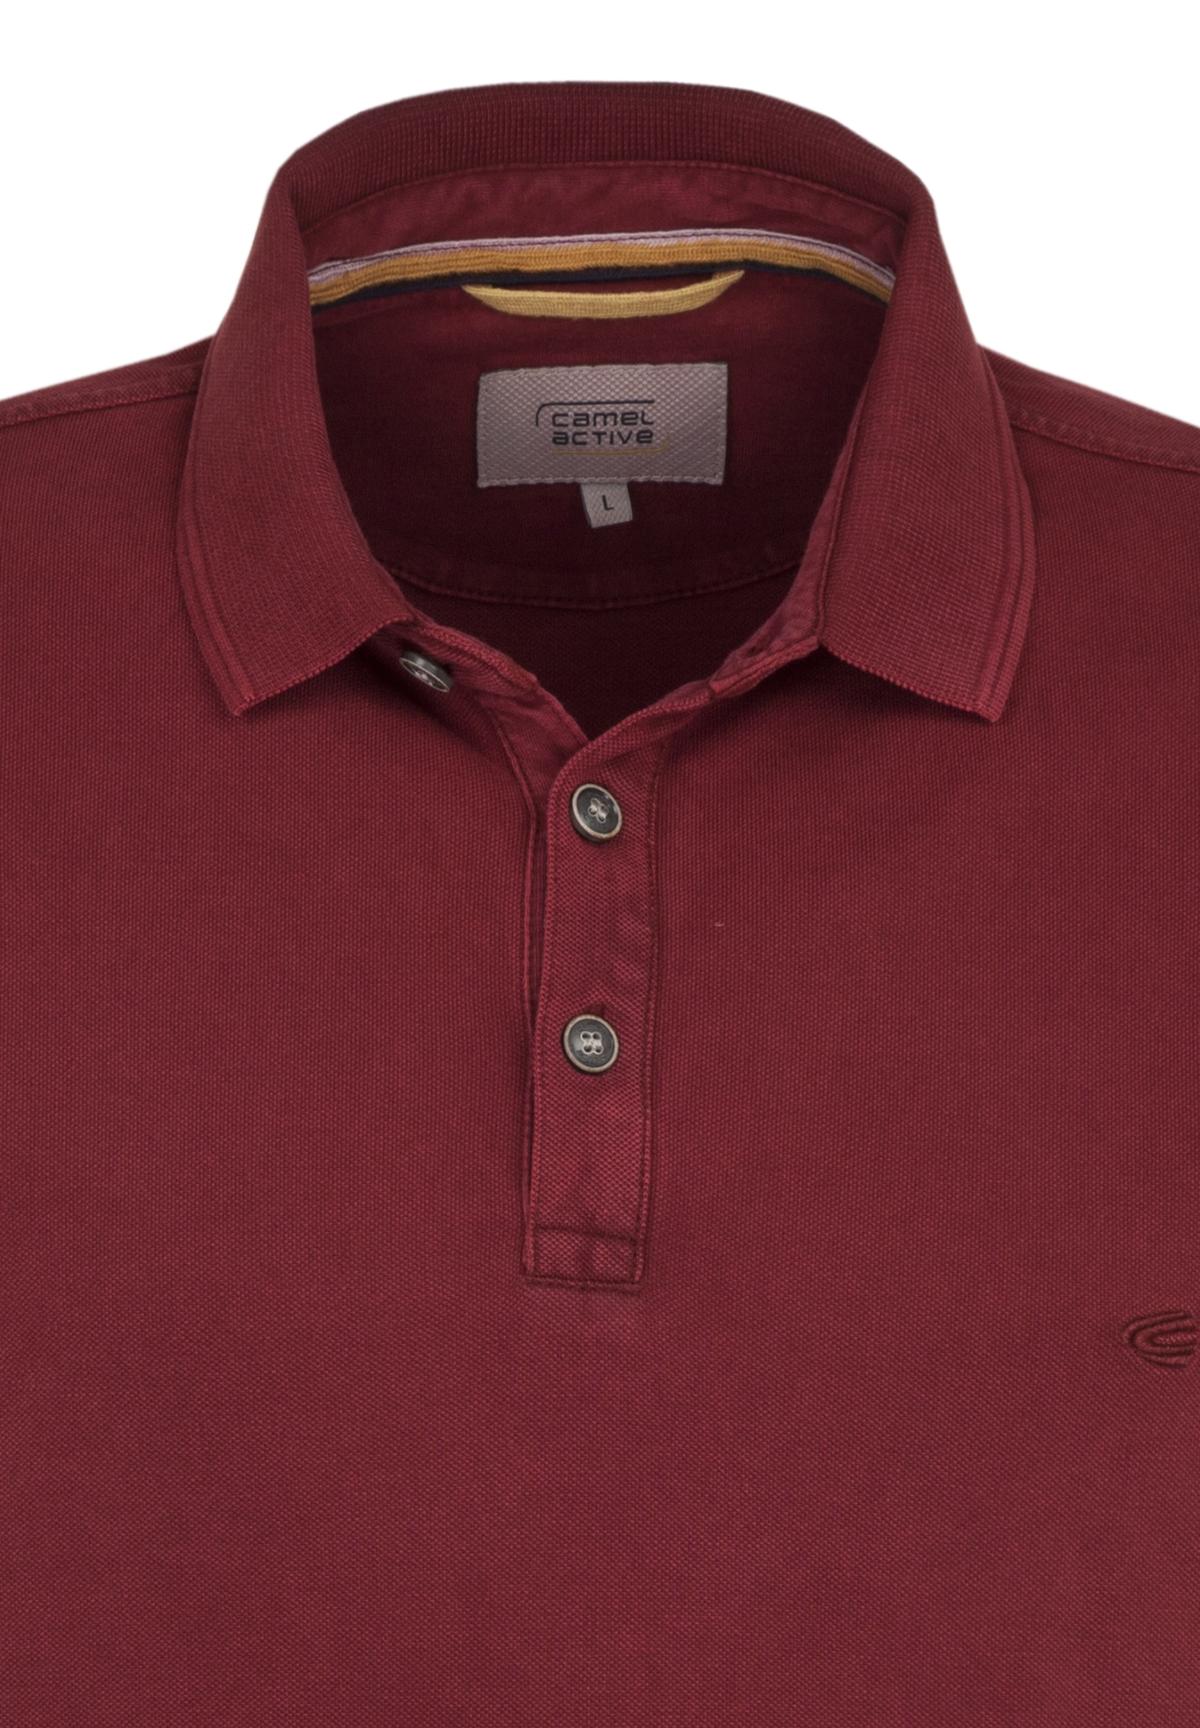 Camel-Active-Herren-Shirt-Poloshirt-Pique-Regular-Fit-NEU Indexbild 55